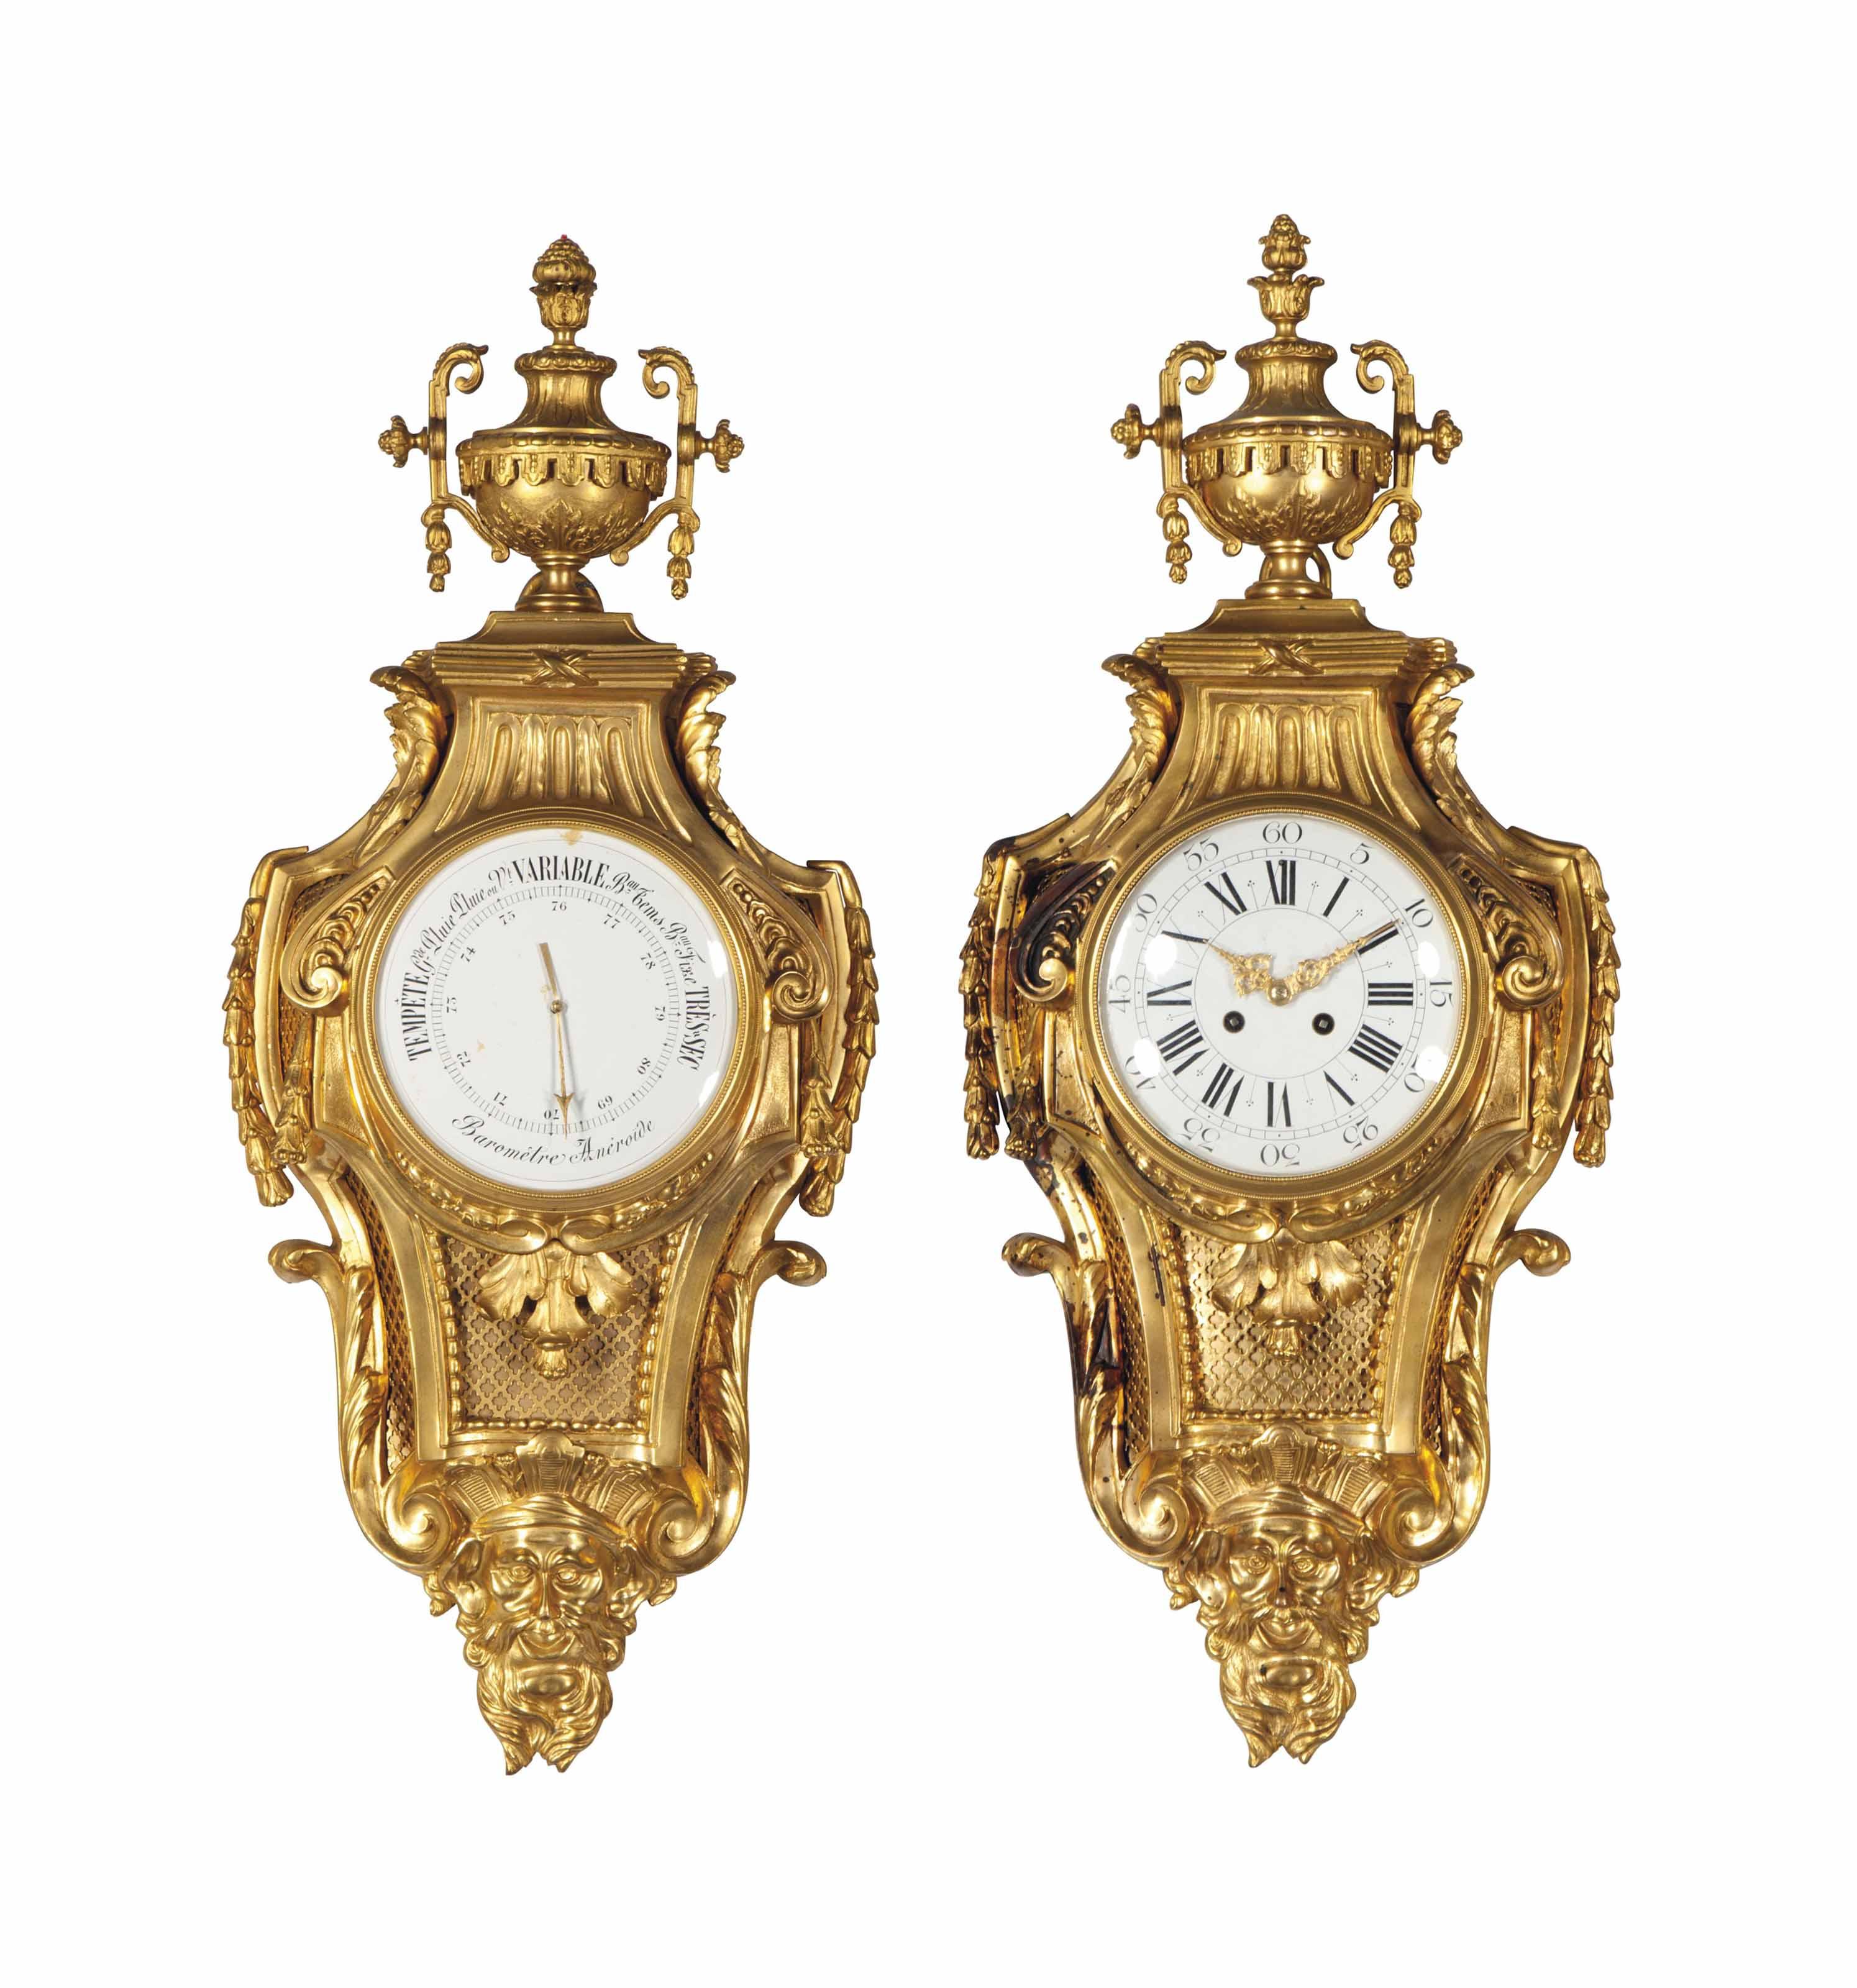 A FRENCH ORMOLU CLOCK AND BARO